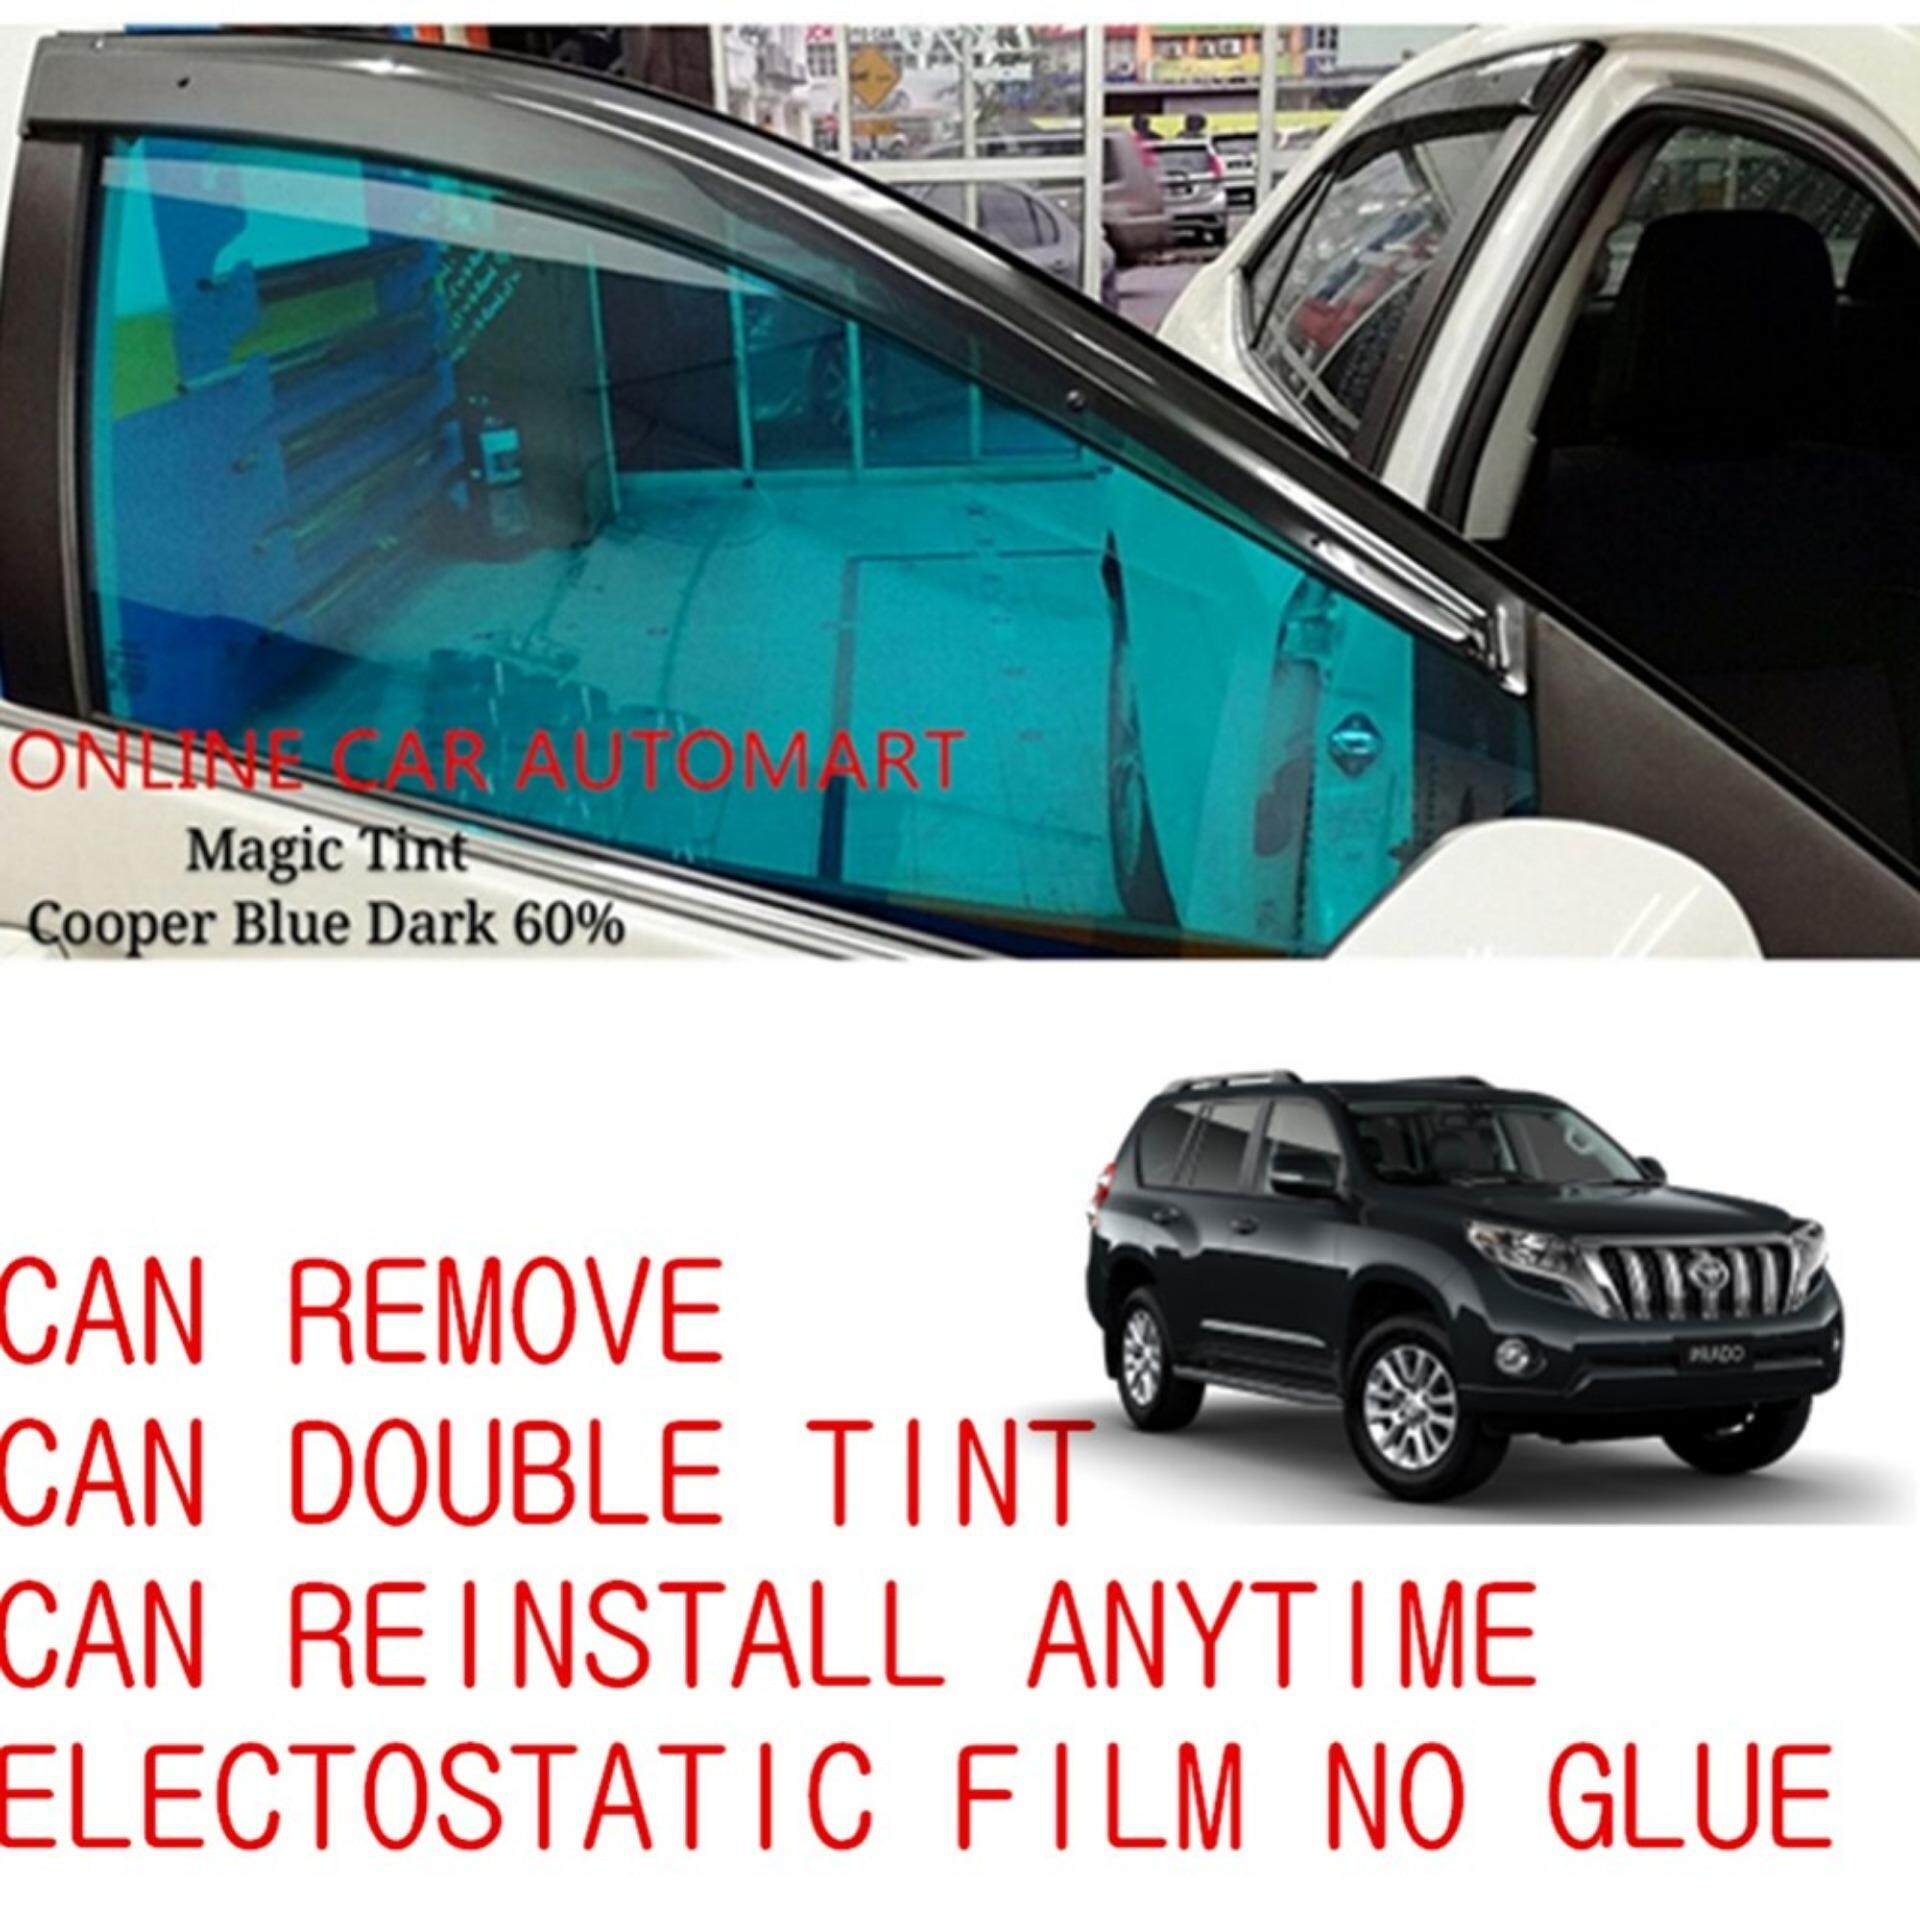 OEM Pre-Cut Shape Magic Tinted Solar Tinted (4 Windows) 60% Cooper Blue Dark For Toyota Land Cruiser Prado